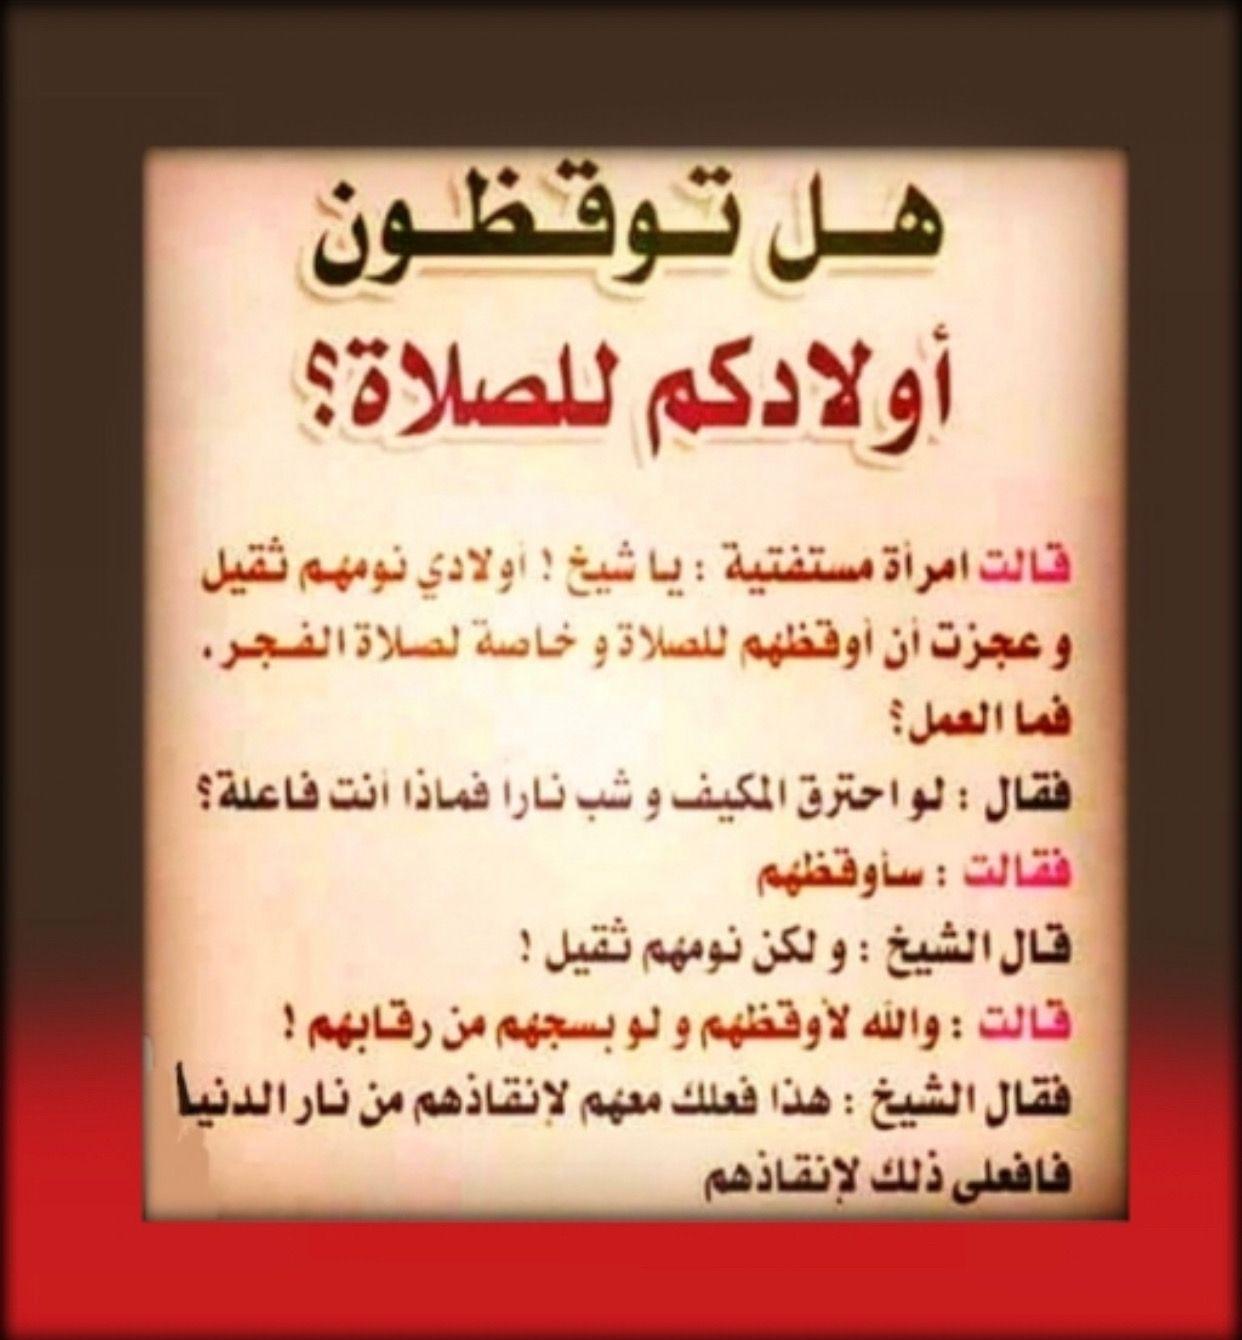 Pin By خليفه On اذكارات Arabic Calligraphy Calligraphy